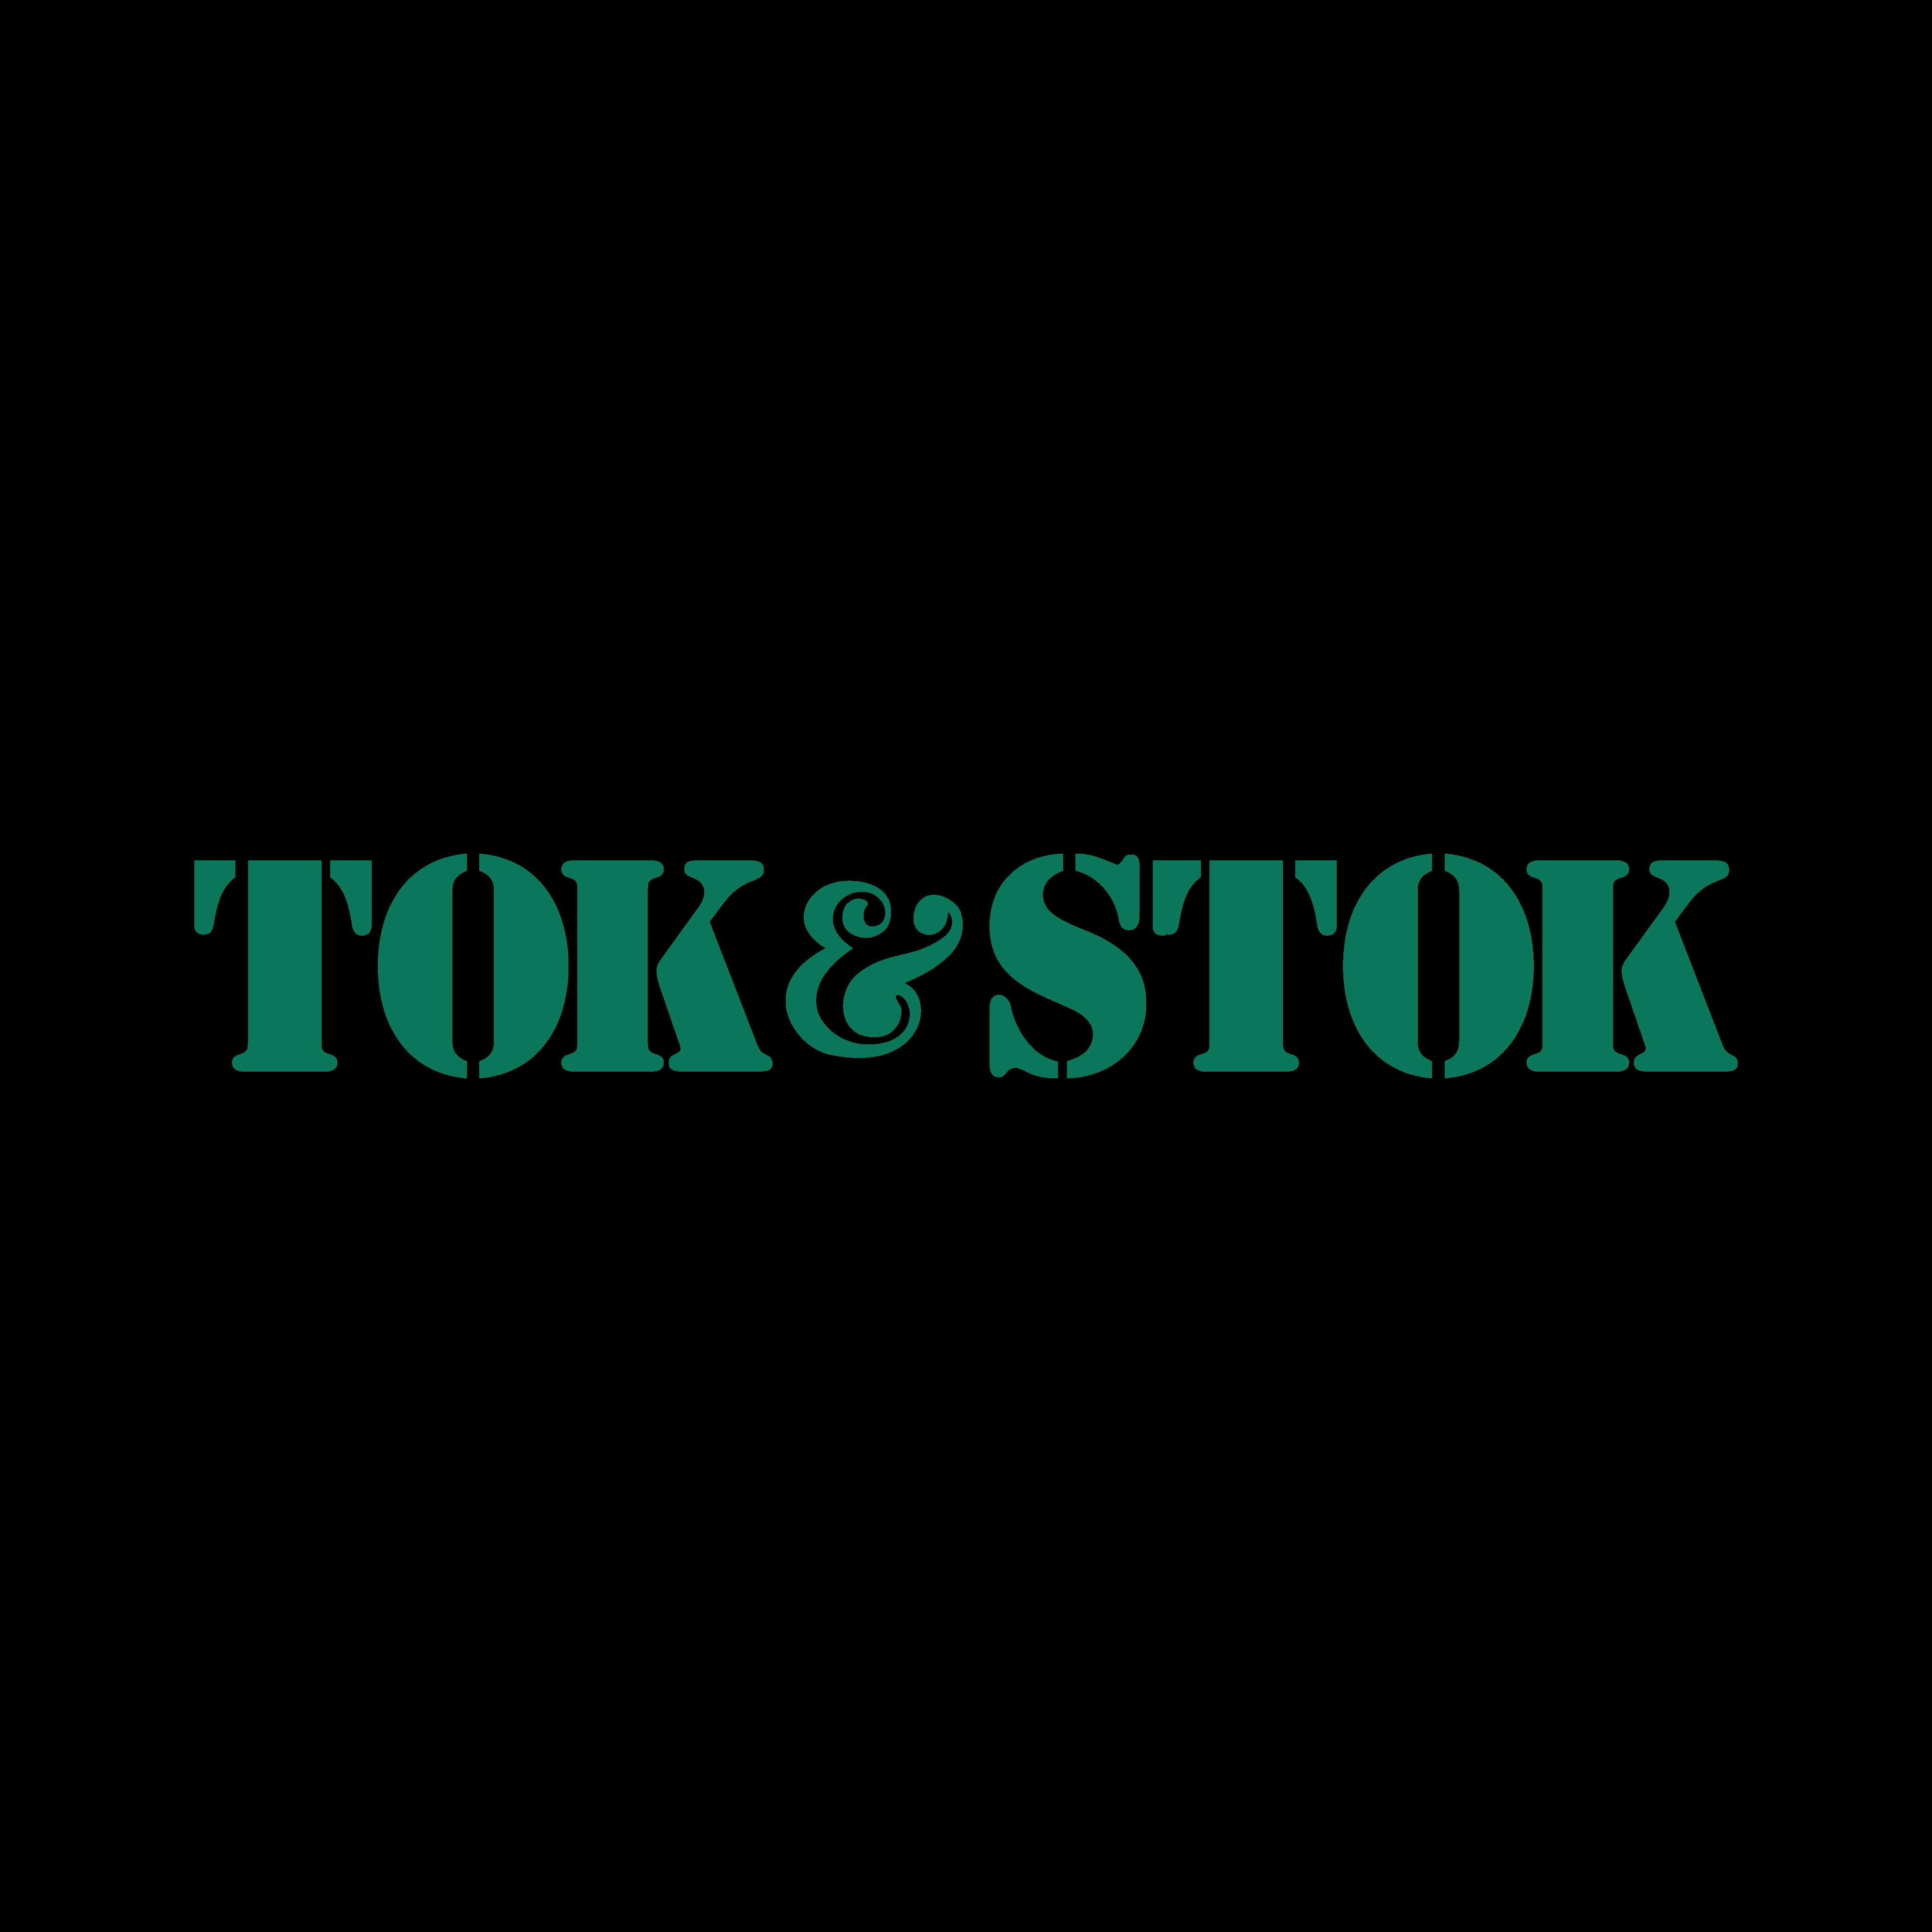 Tok&Stok Logo PNG.